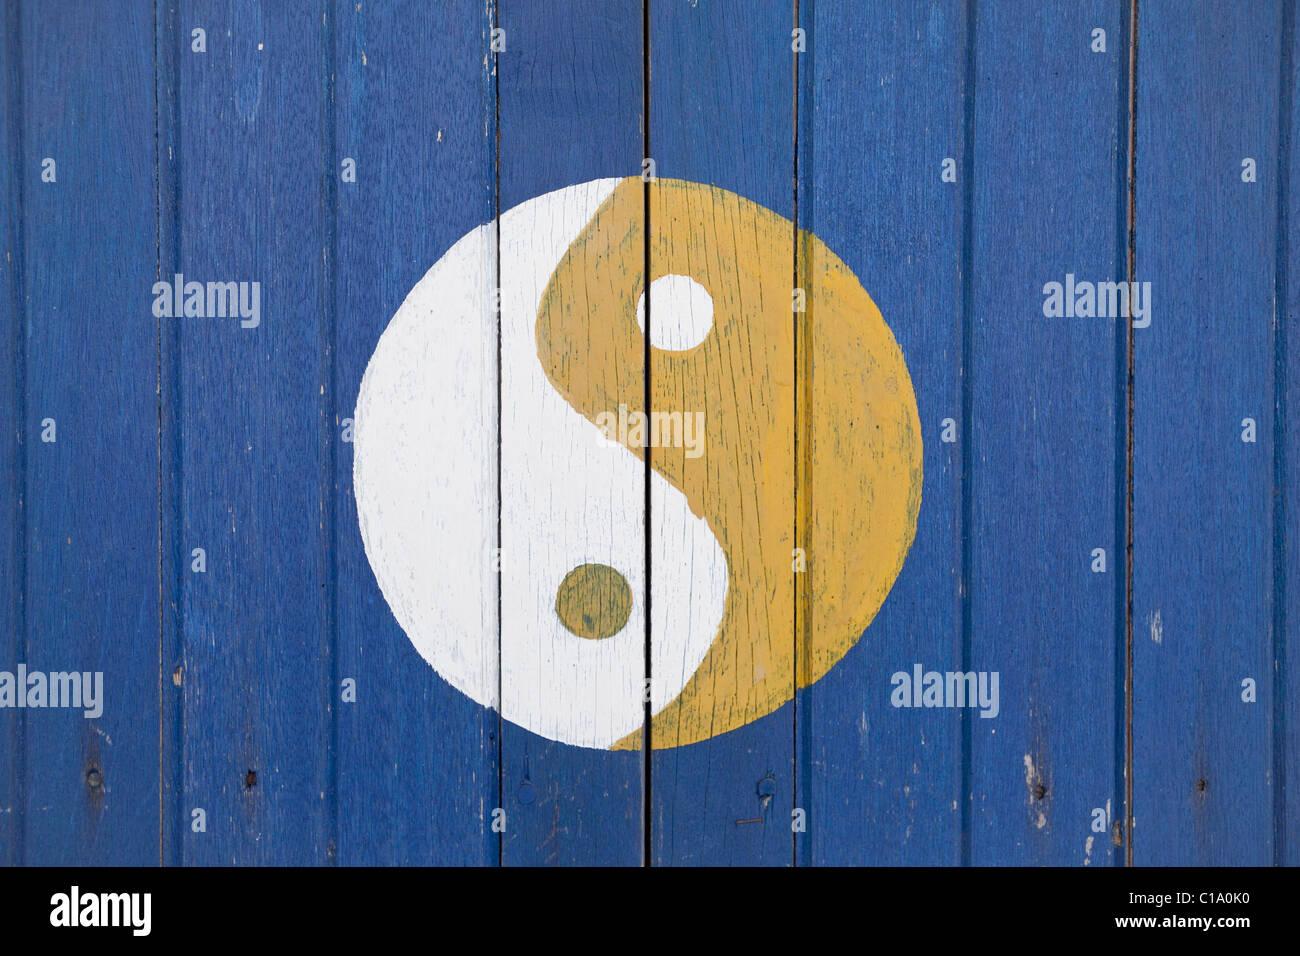 Il cinese ying yang o tao simbolo dipinto su persiane in legno Immagini Stock